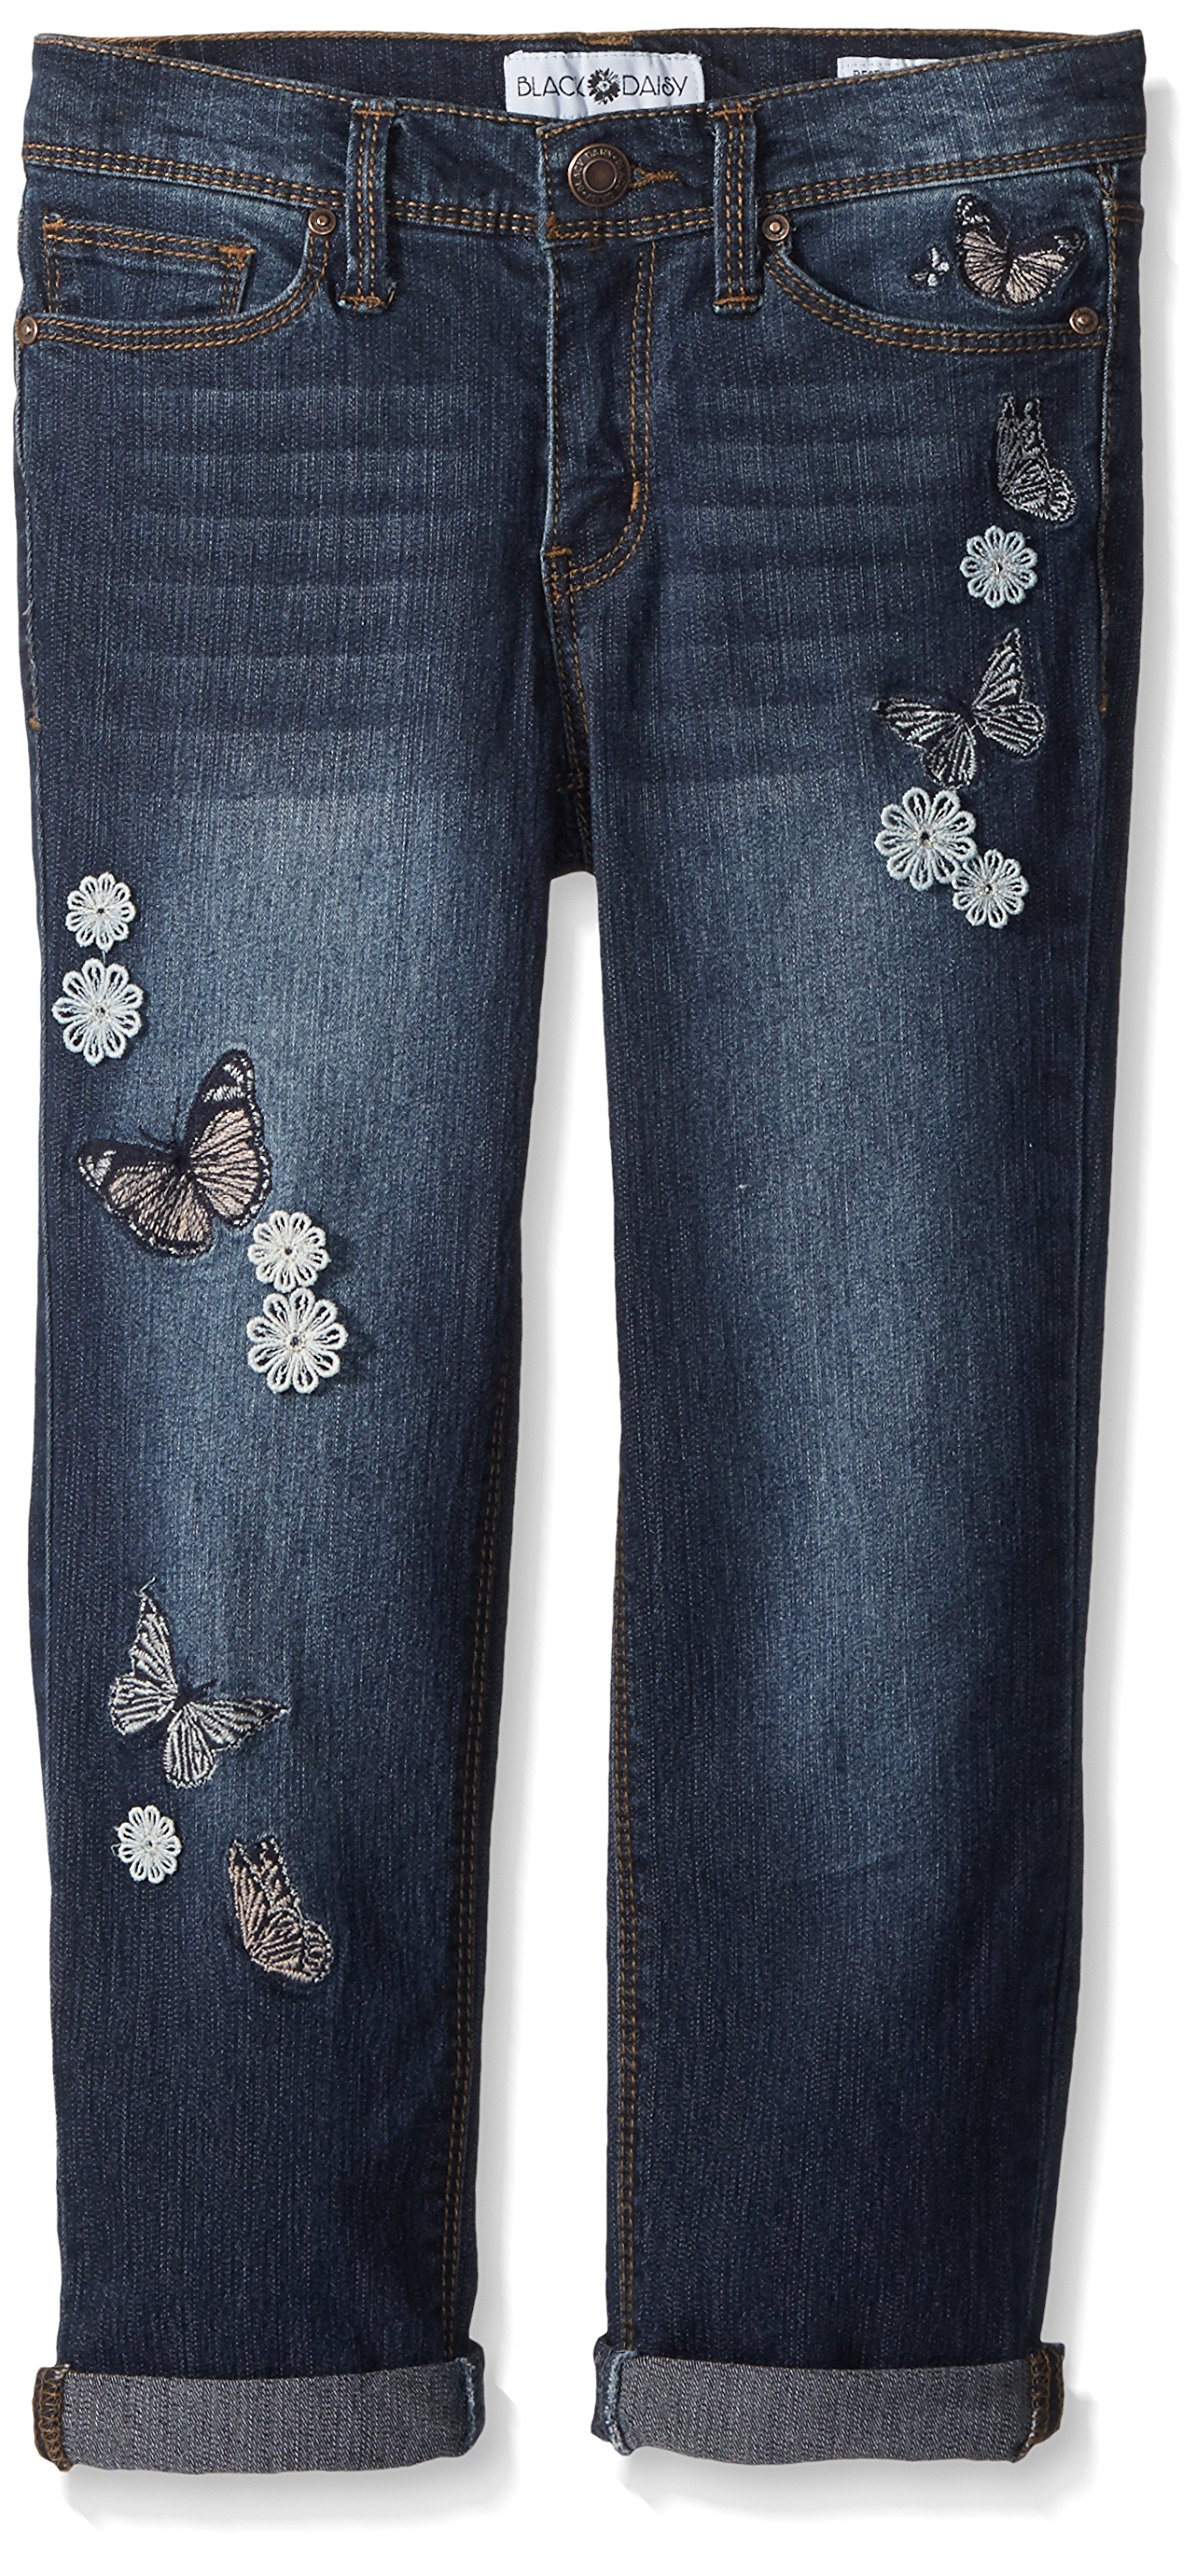 Black Daisy Big Girls' Tween Best Friend Relaxed Skinny Jean, Rinse Butterfly Embroidery, 8